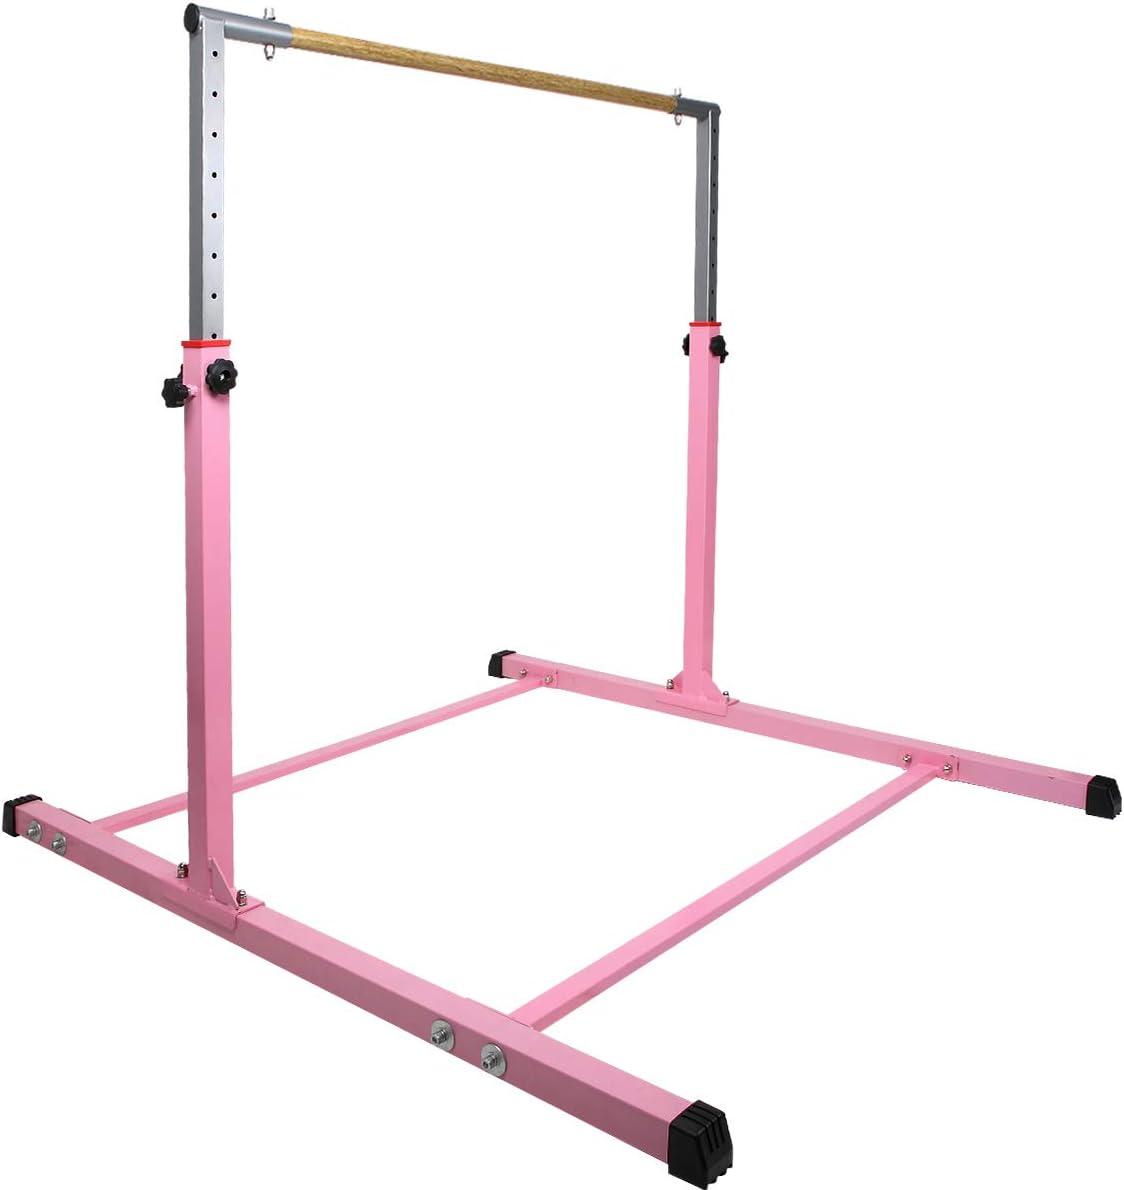 Height Adjustable 3 to 5 Horizontal Kip Bar for Kids SHIWEI Gymnastics Training Bar